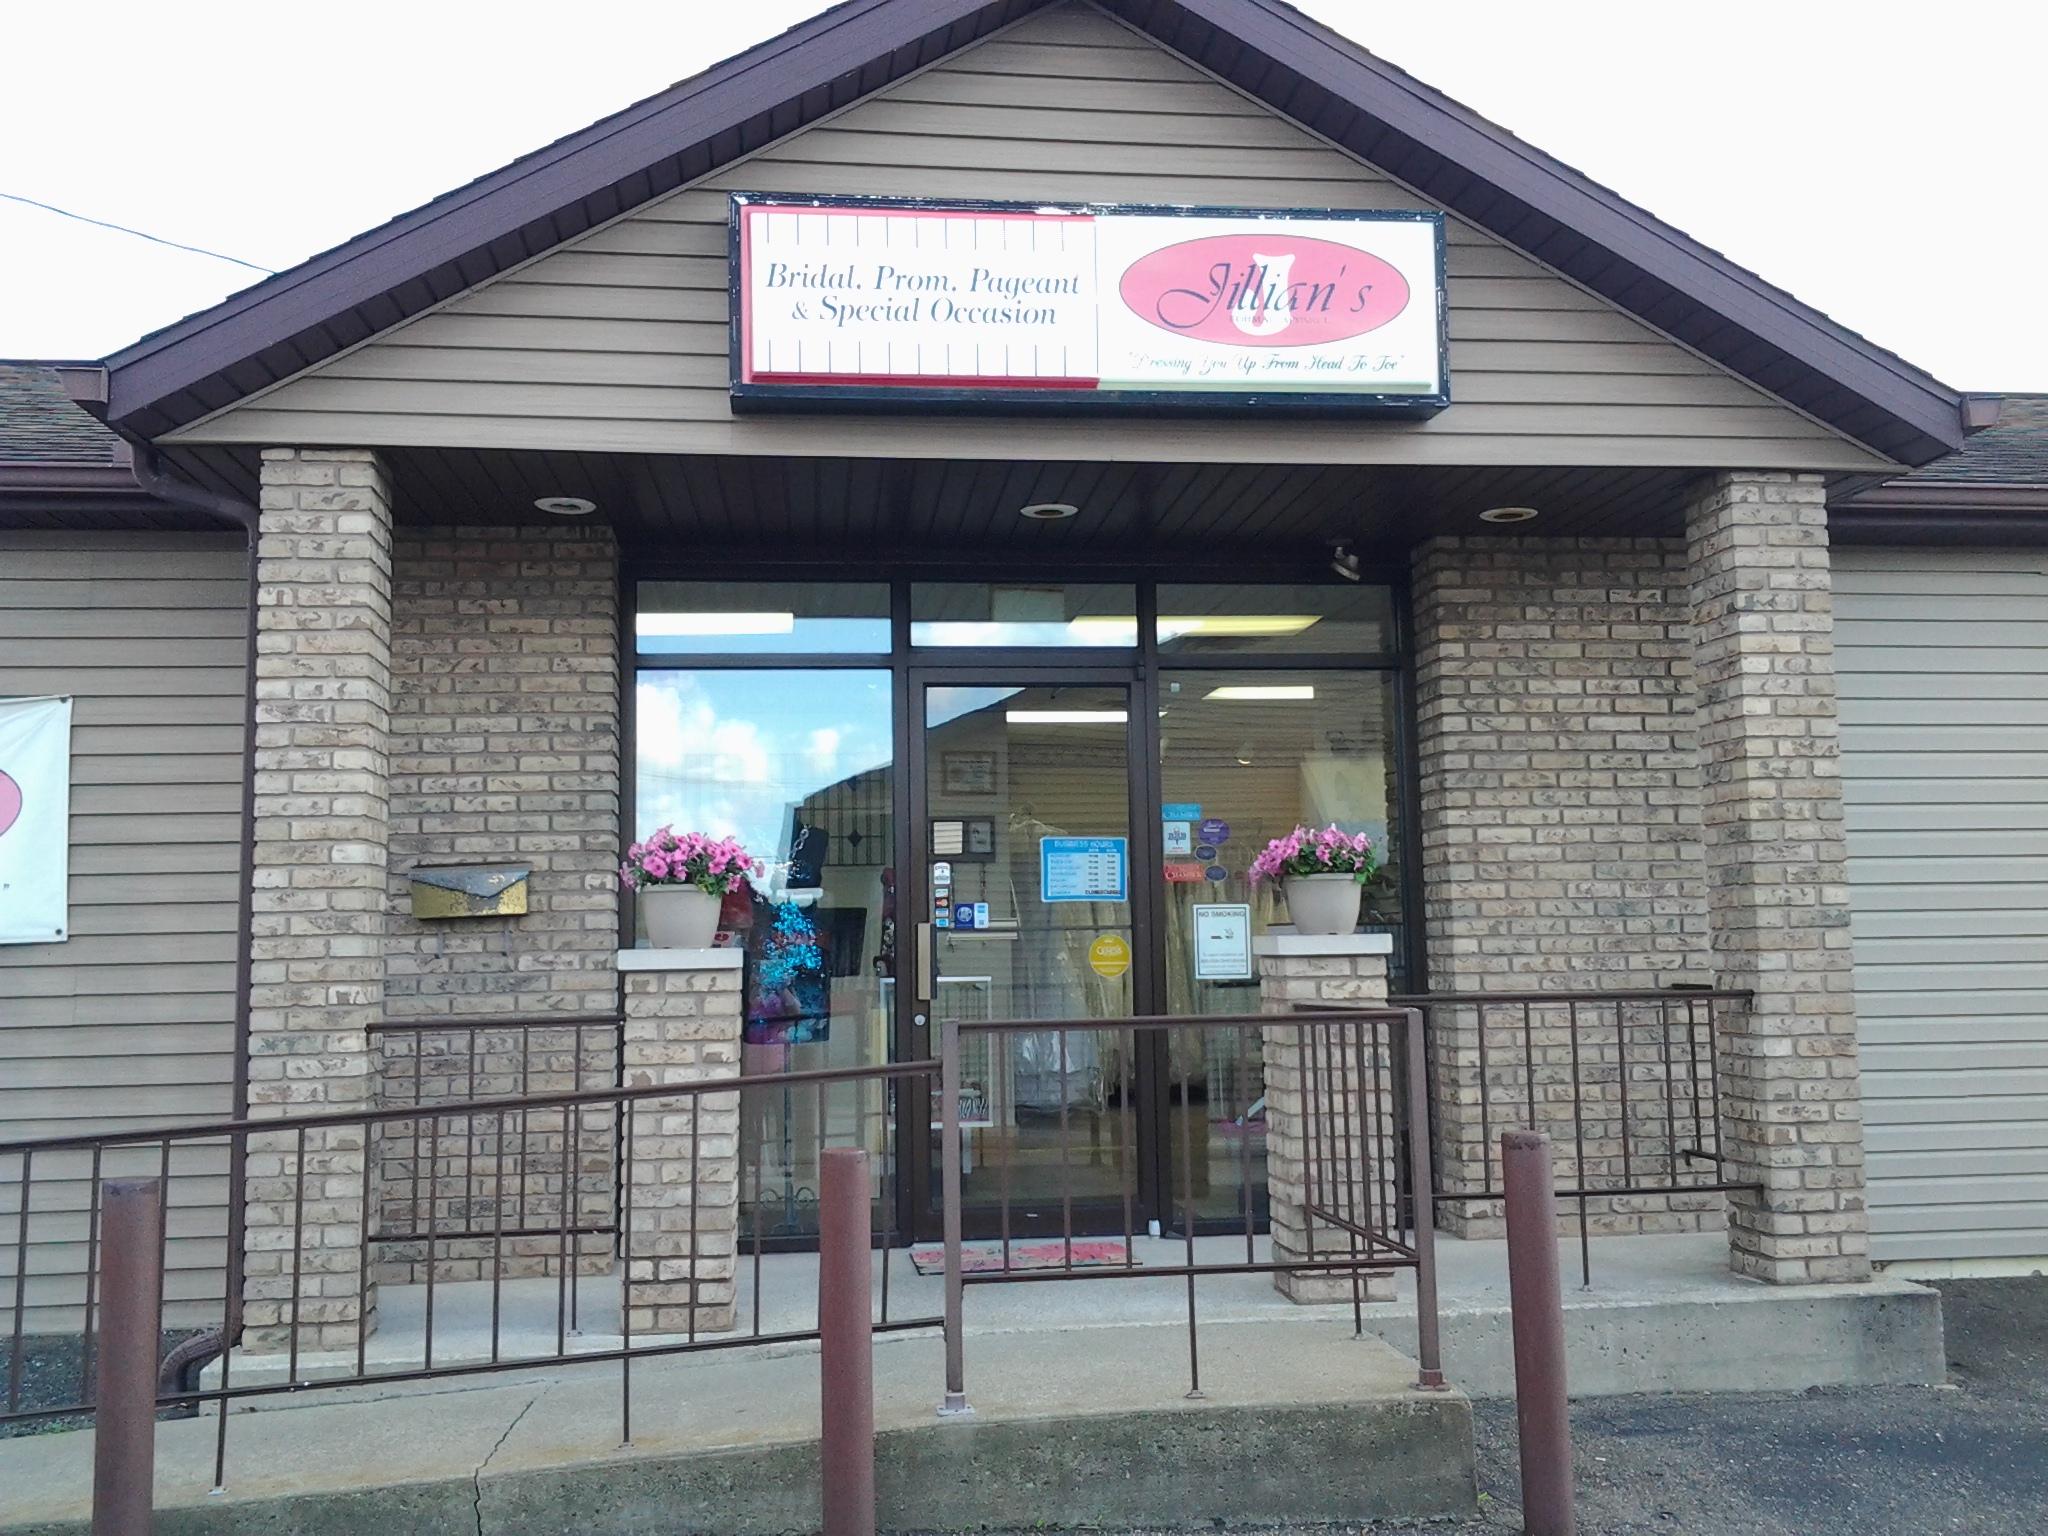 Jillian's 2347 Maple Ave, Zanesville, OH 43701 - YP.com